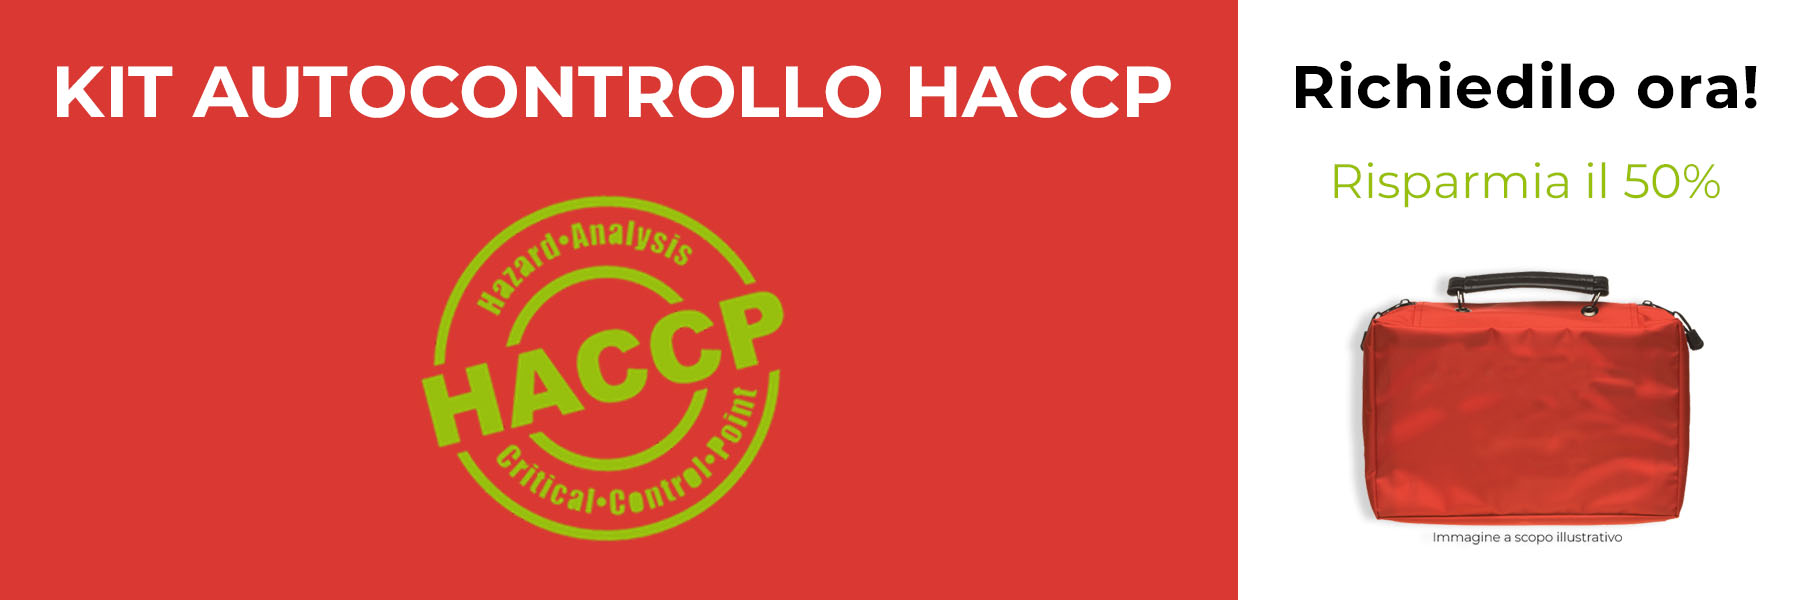 Kit autocontrollo HACCP